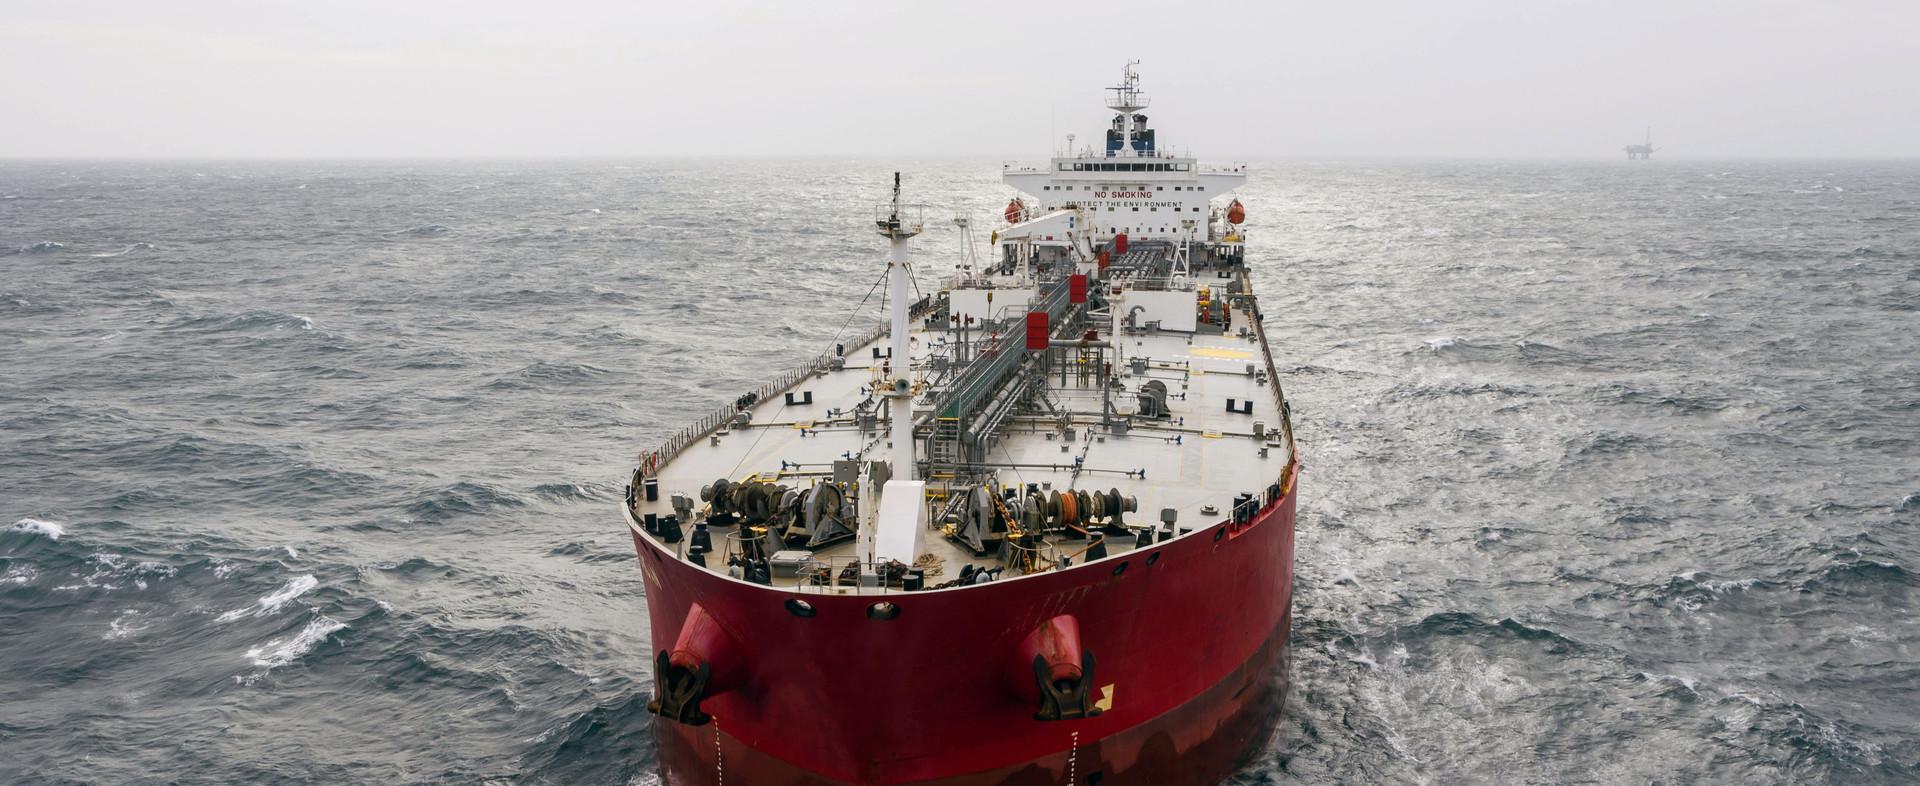 The oil tanker in the high sea.jpg